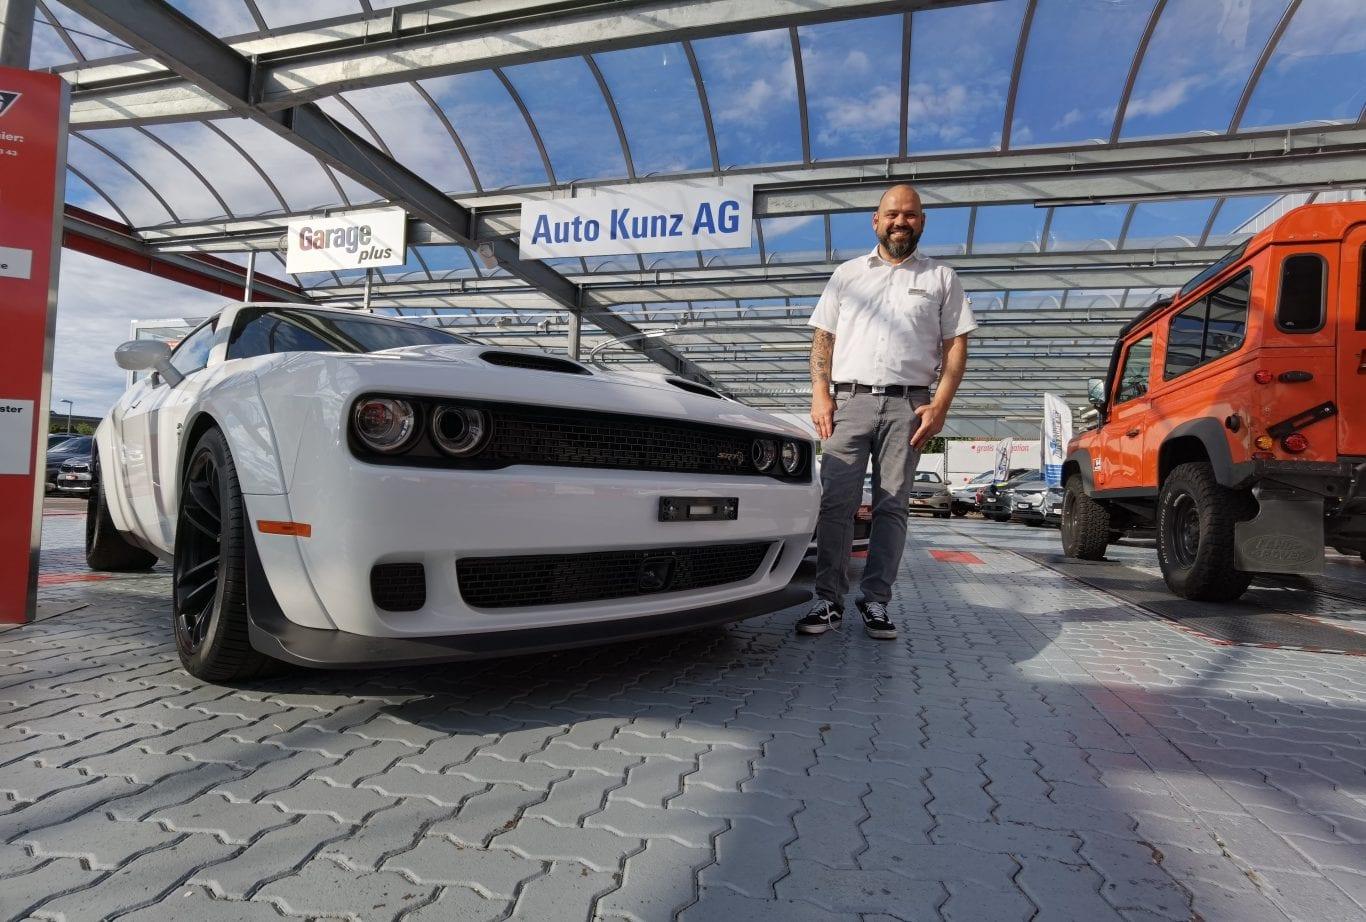 Thomas Stocker: 25 Jahre Auto Kunz… 28, um genau zu sein - Auto Kunz AG 1